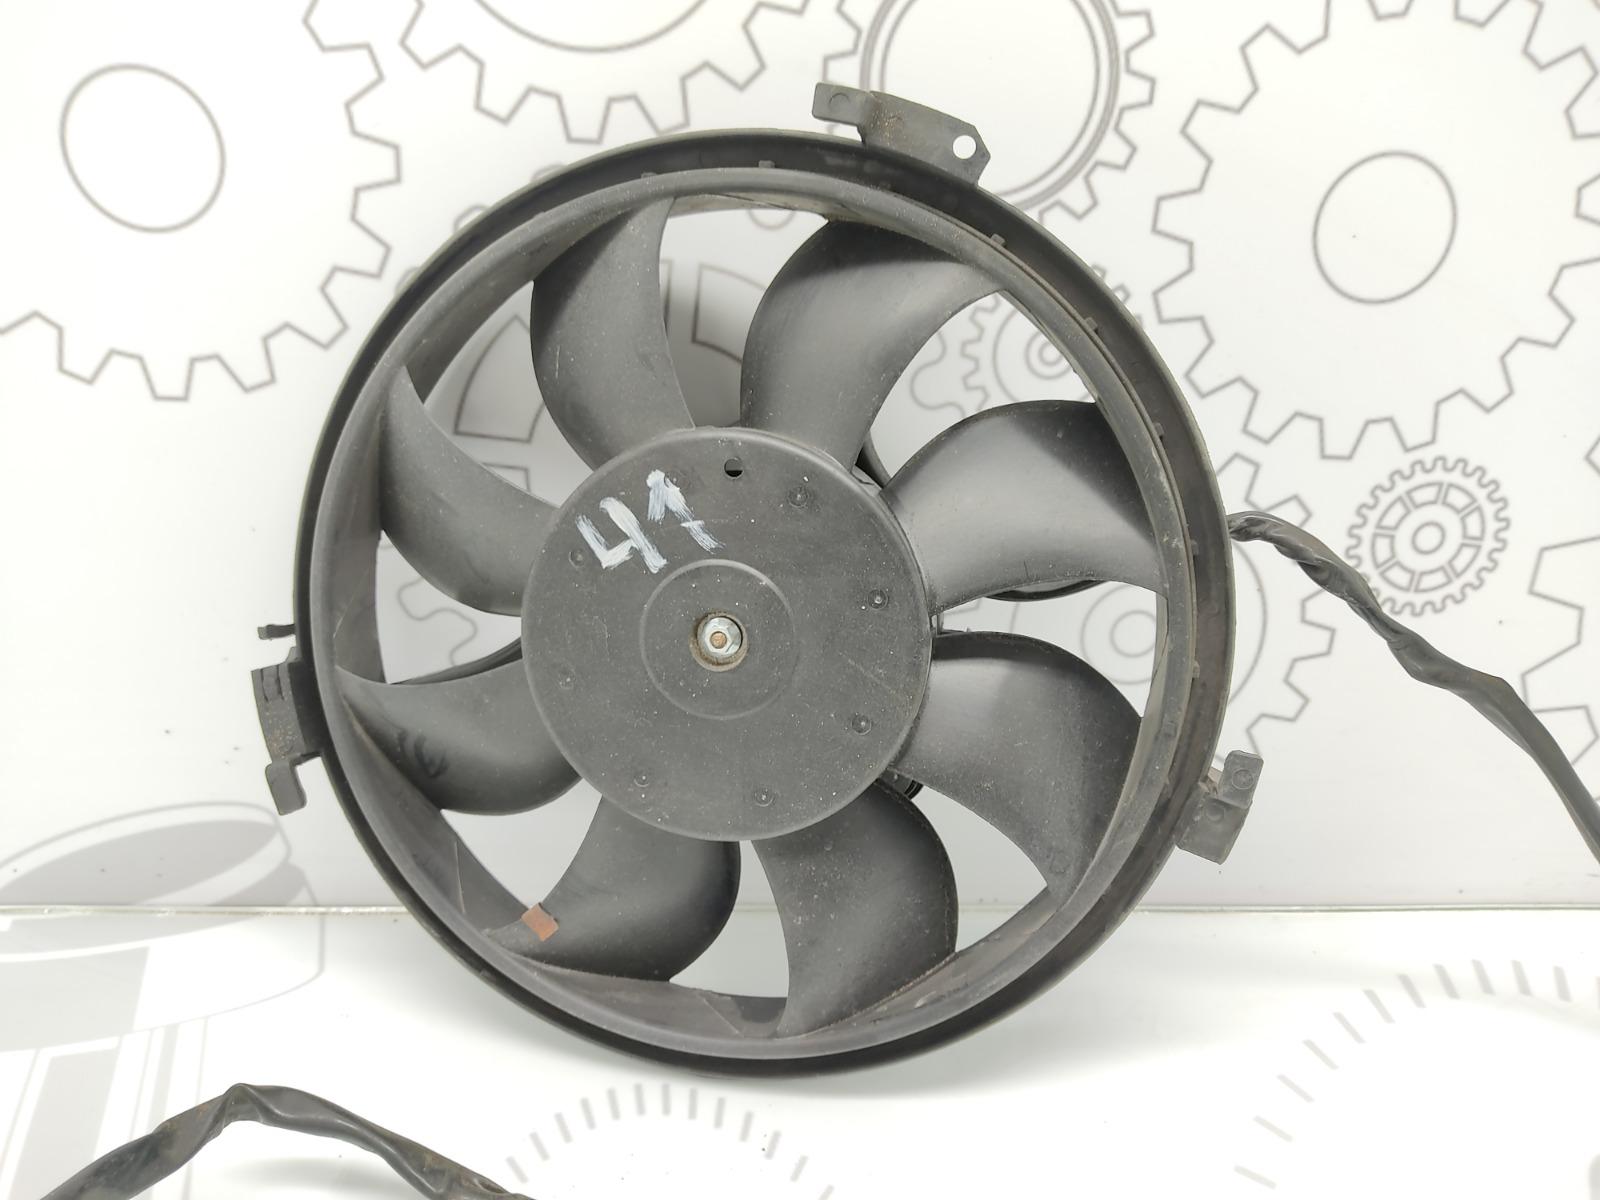 Вентилятор радиатора Skoda Superb 1.9 TDI 2005 (б/у)